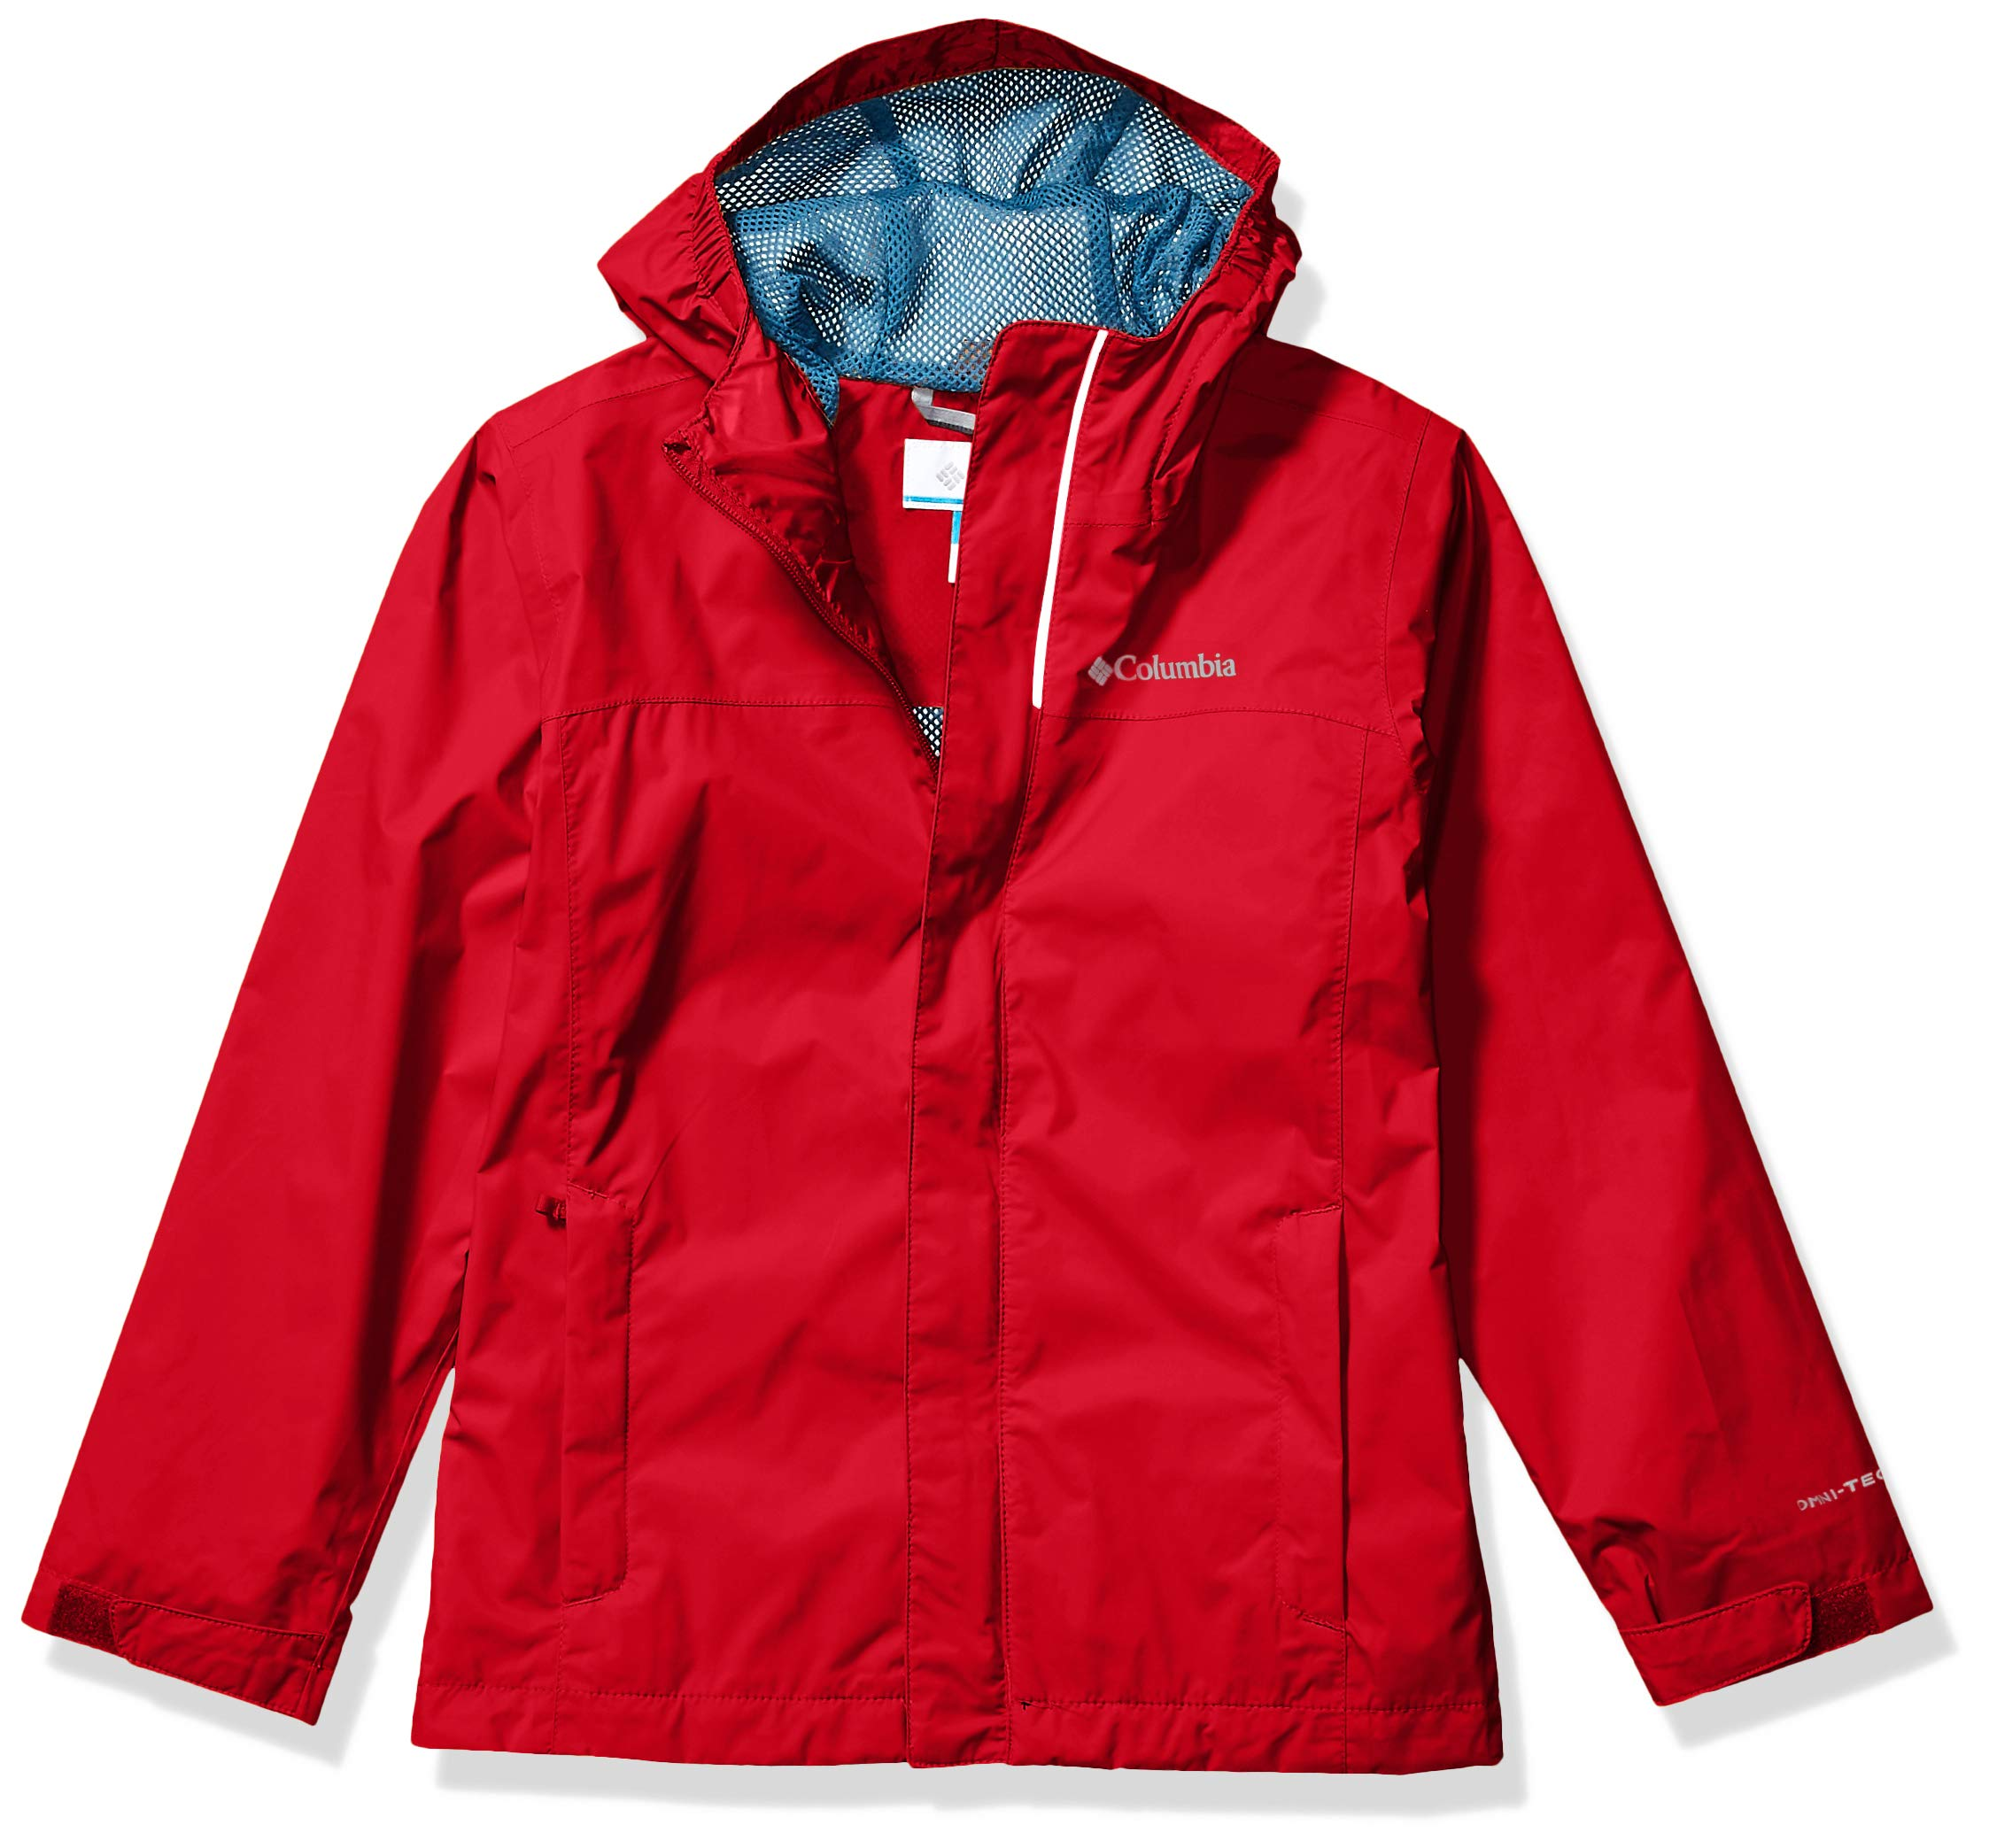 Columbia Boys' Big Watertight Jacket, Mountain red, Medium by Columbia